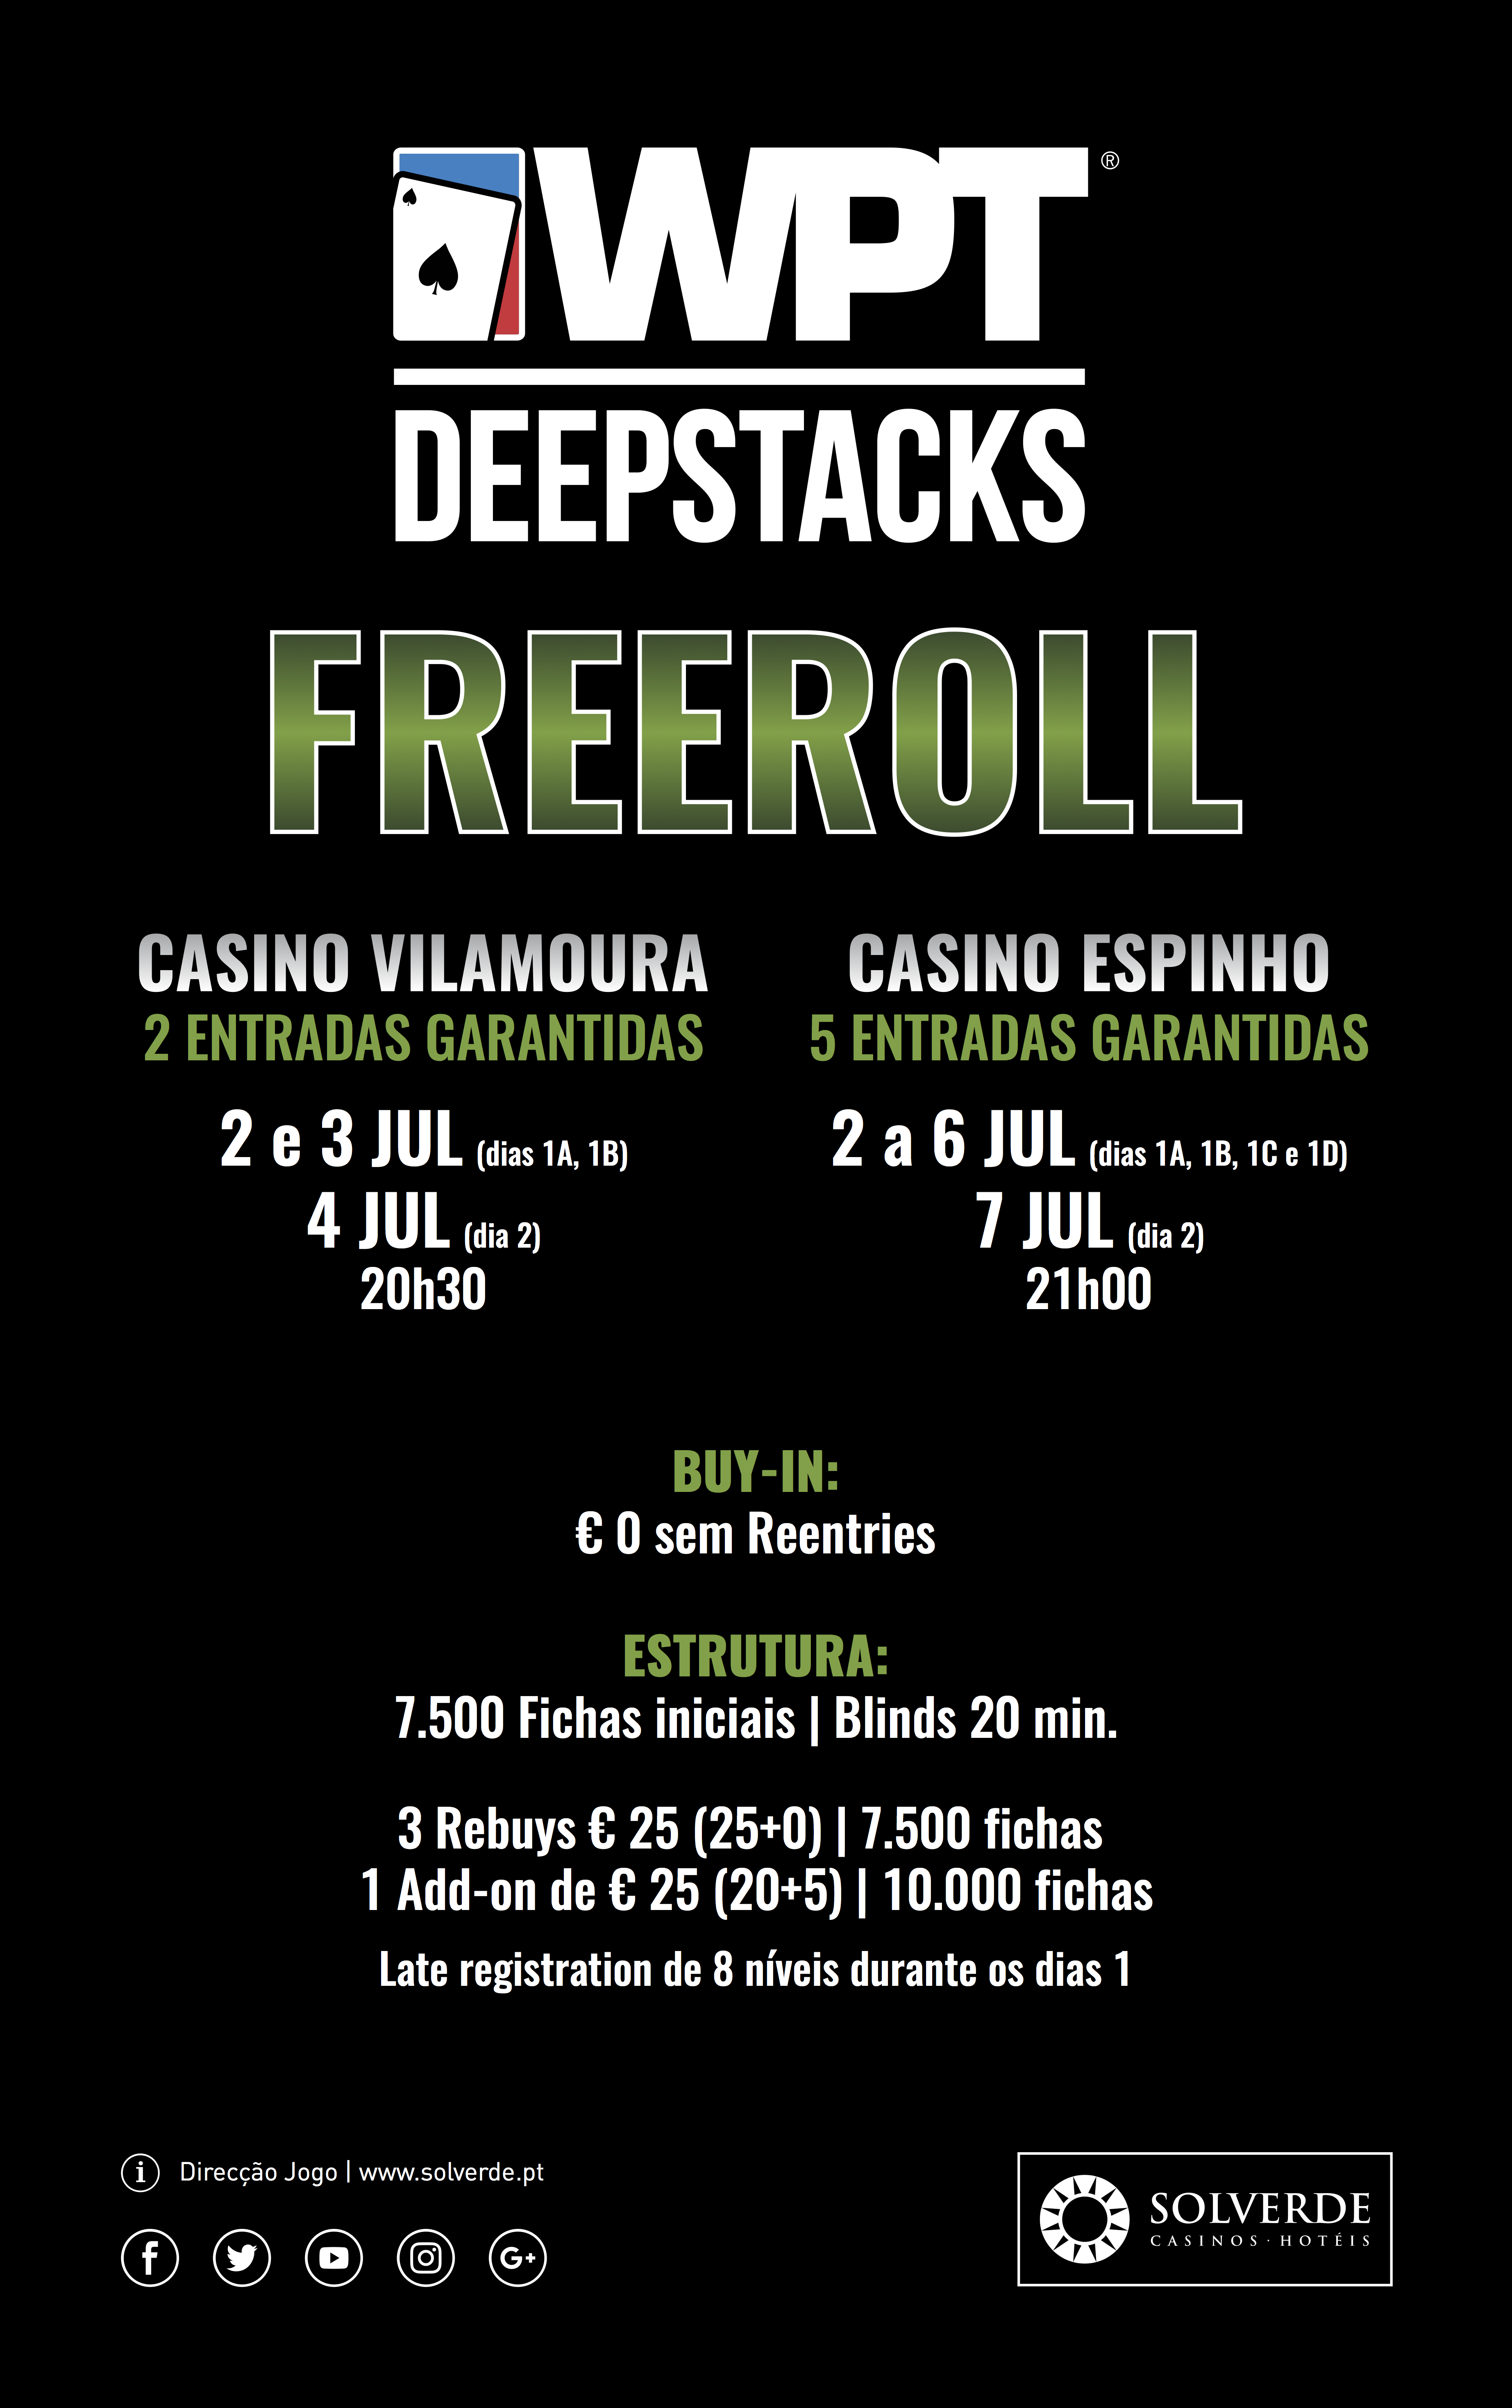 Freeroll para o WPTDeepStack distribui 5 entradas em Vilamoura 101